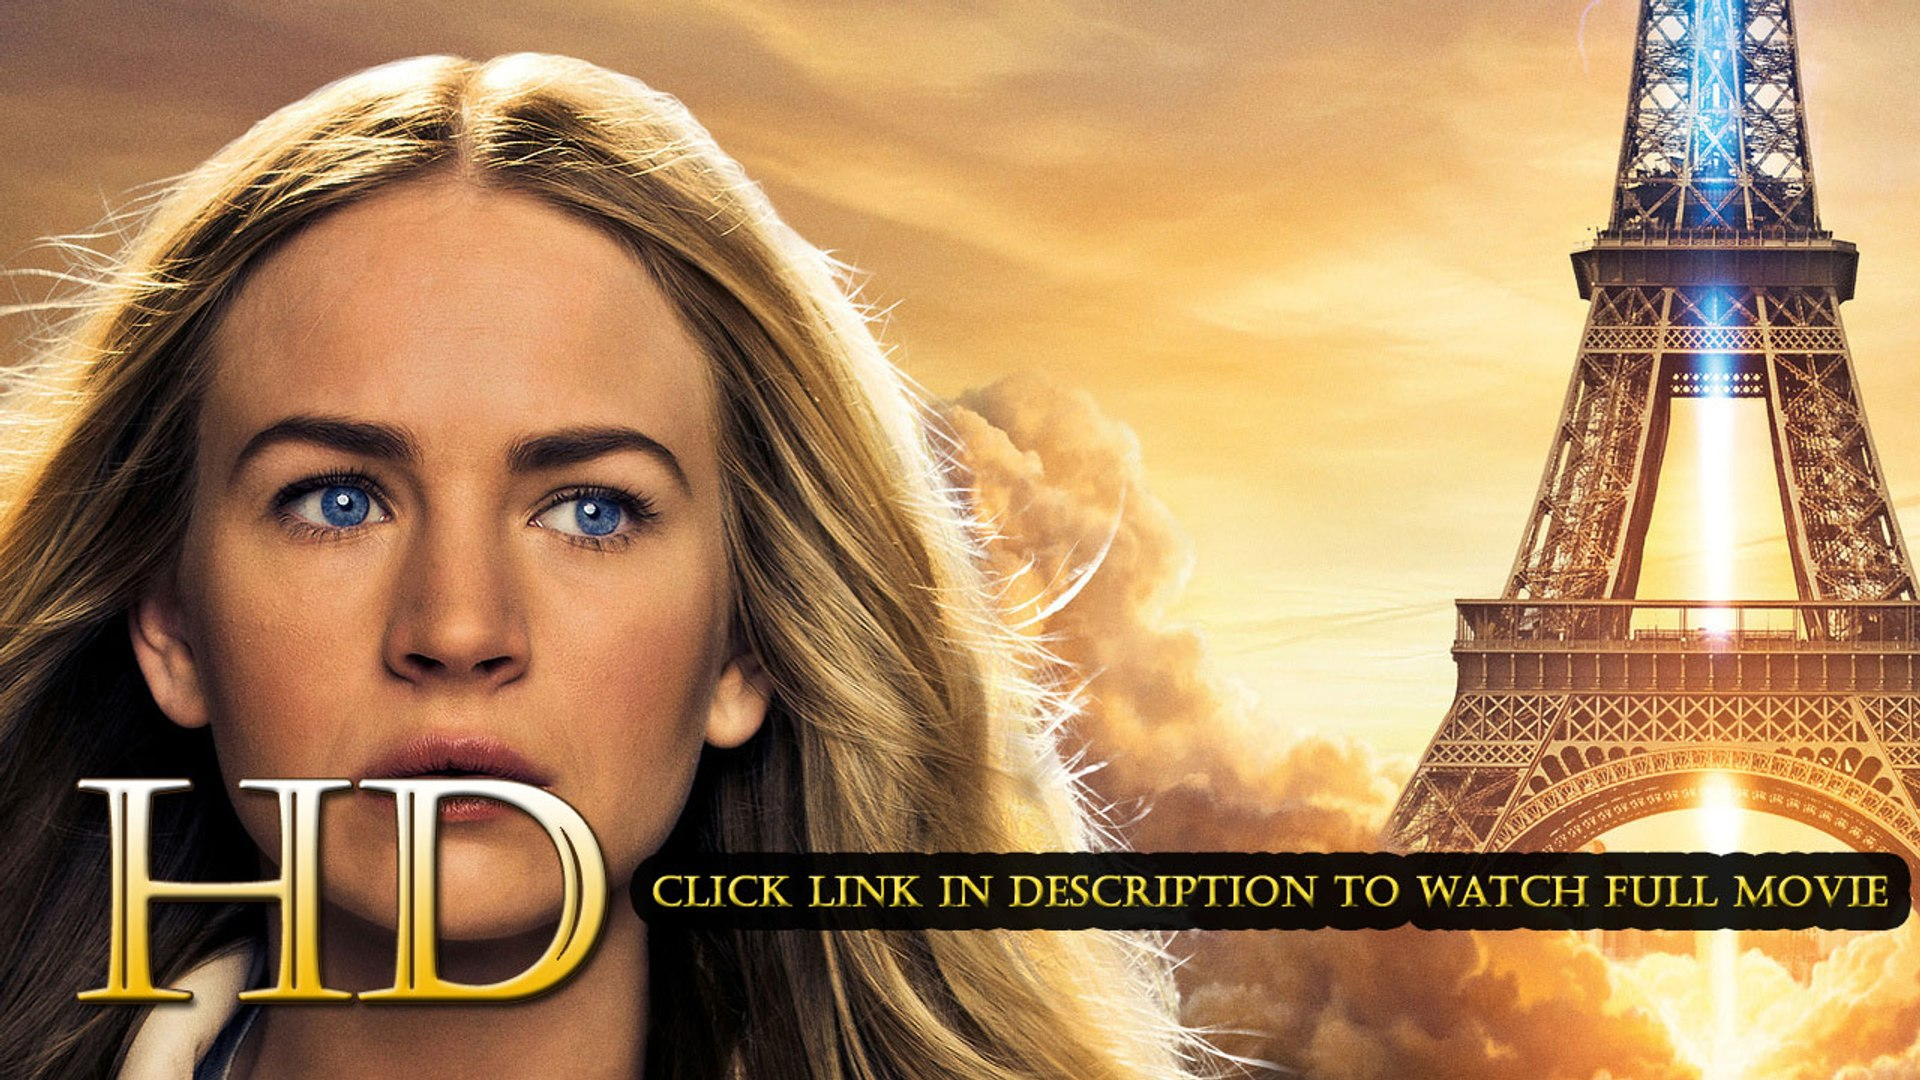 ##⚘STREAM FILM⚘##Watch  Tomorrowland Full Movie Streaming Online @BOENKQB FILM⚘⚘